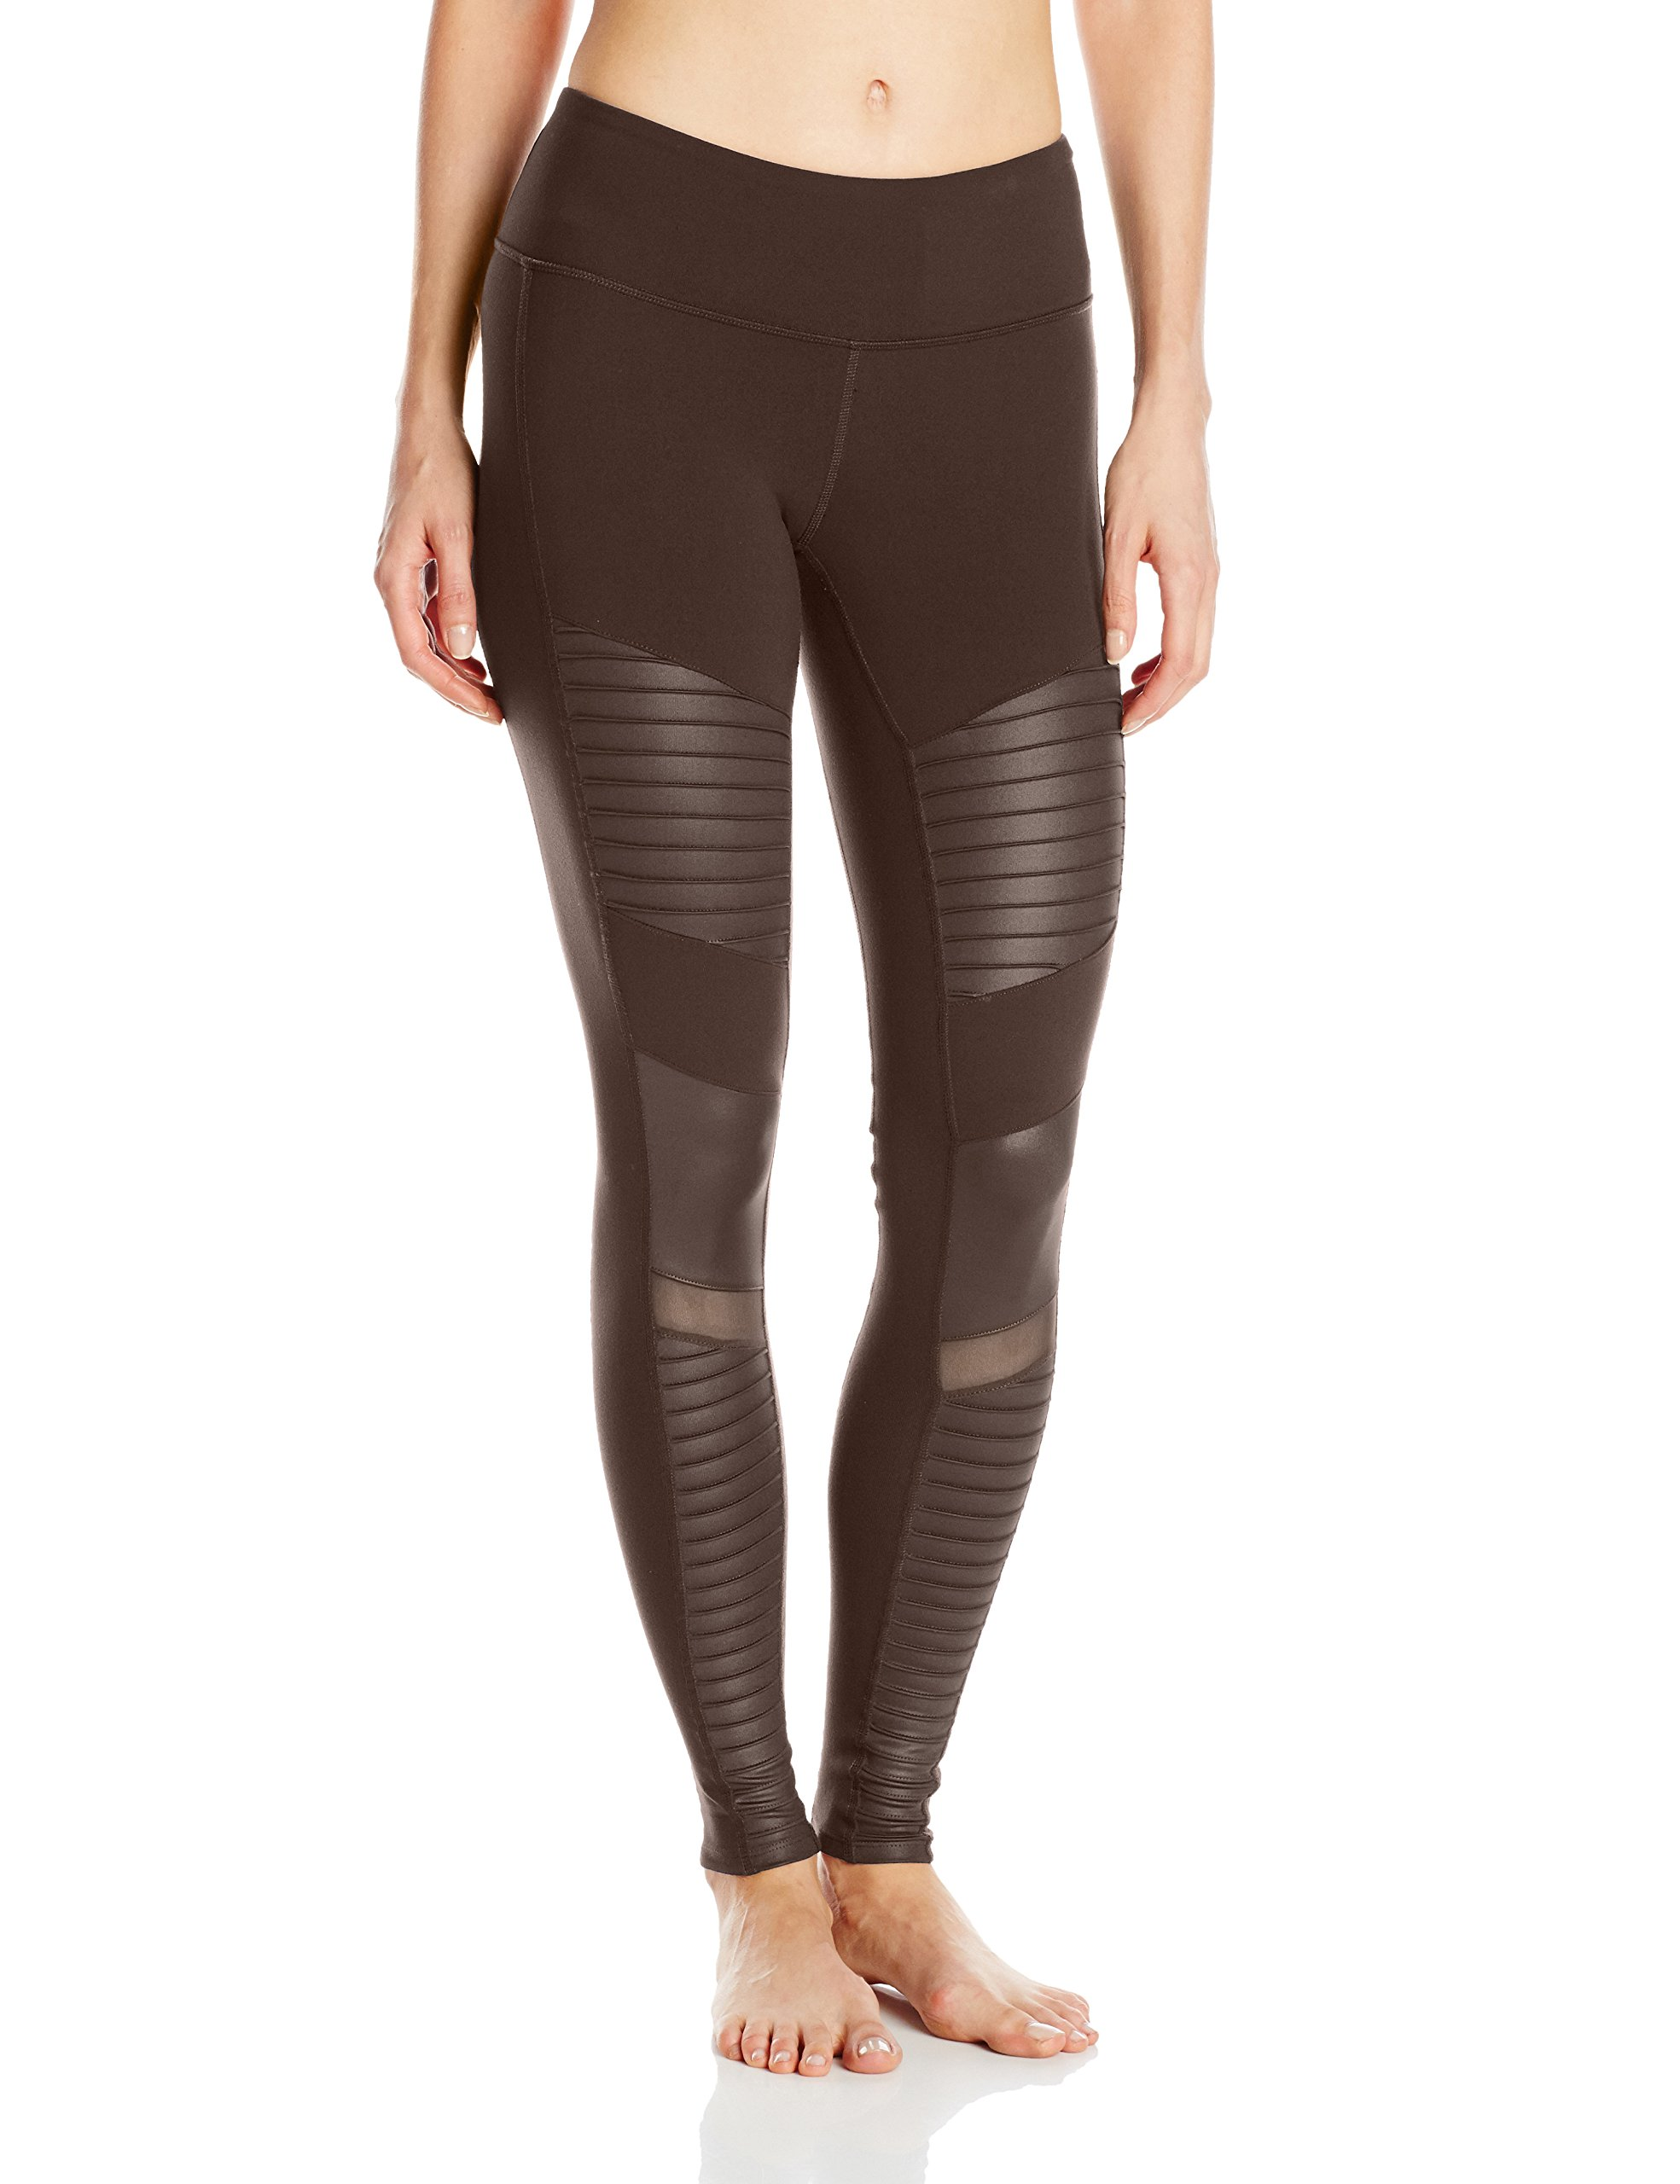 Alo Yoga Women's Moto Legging, Mink/Mink Glossy, Small